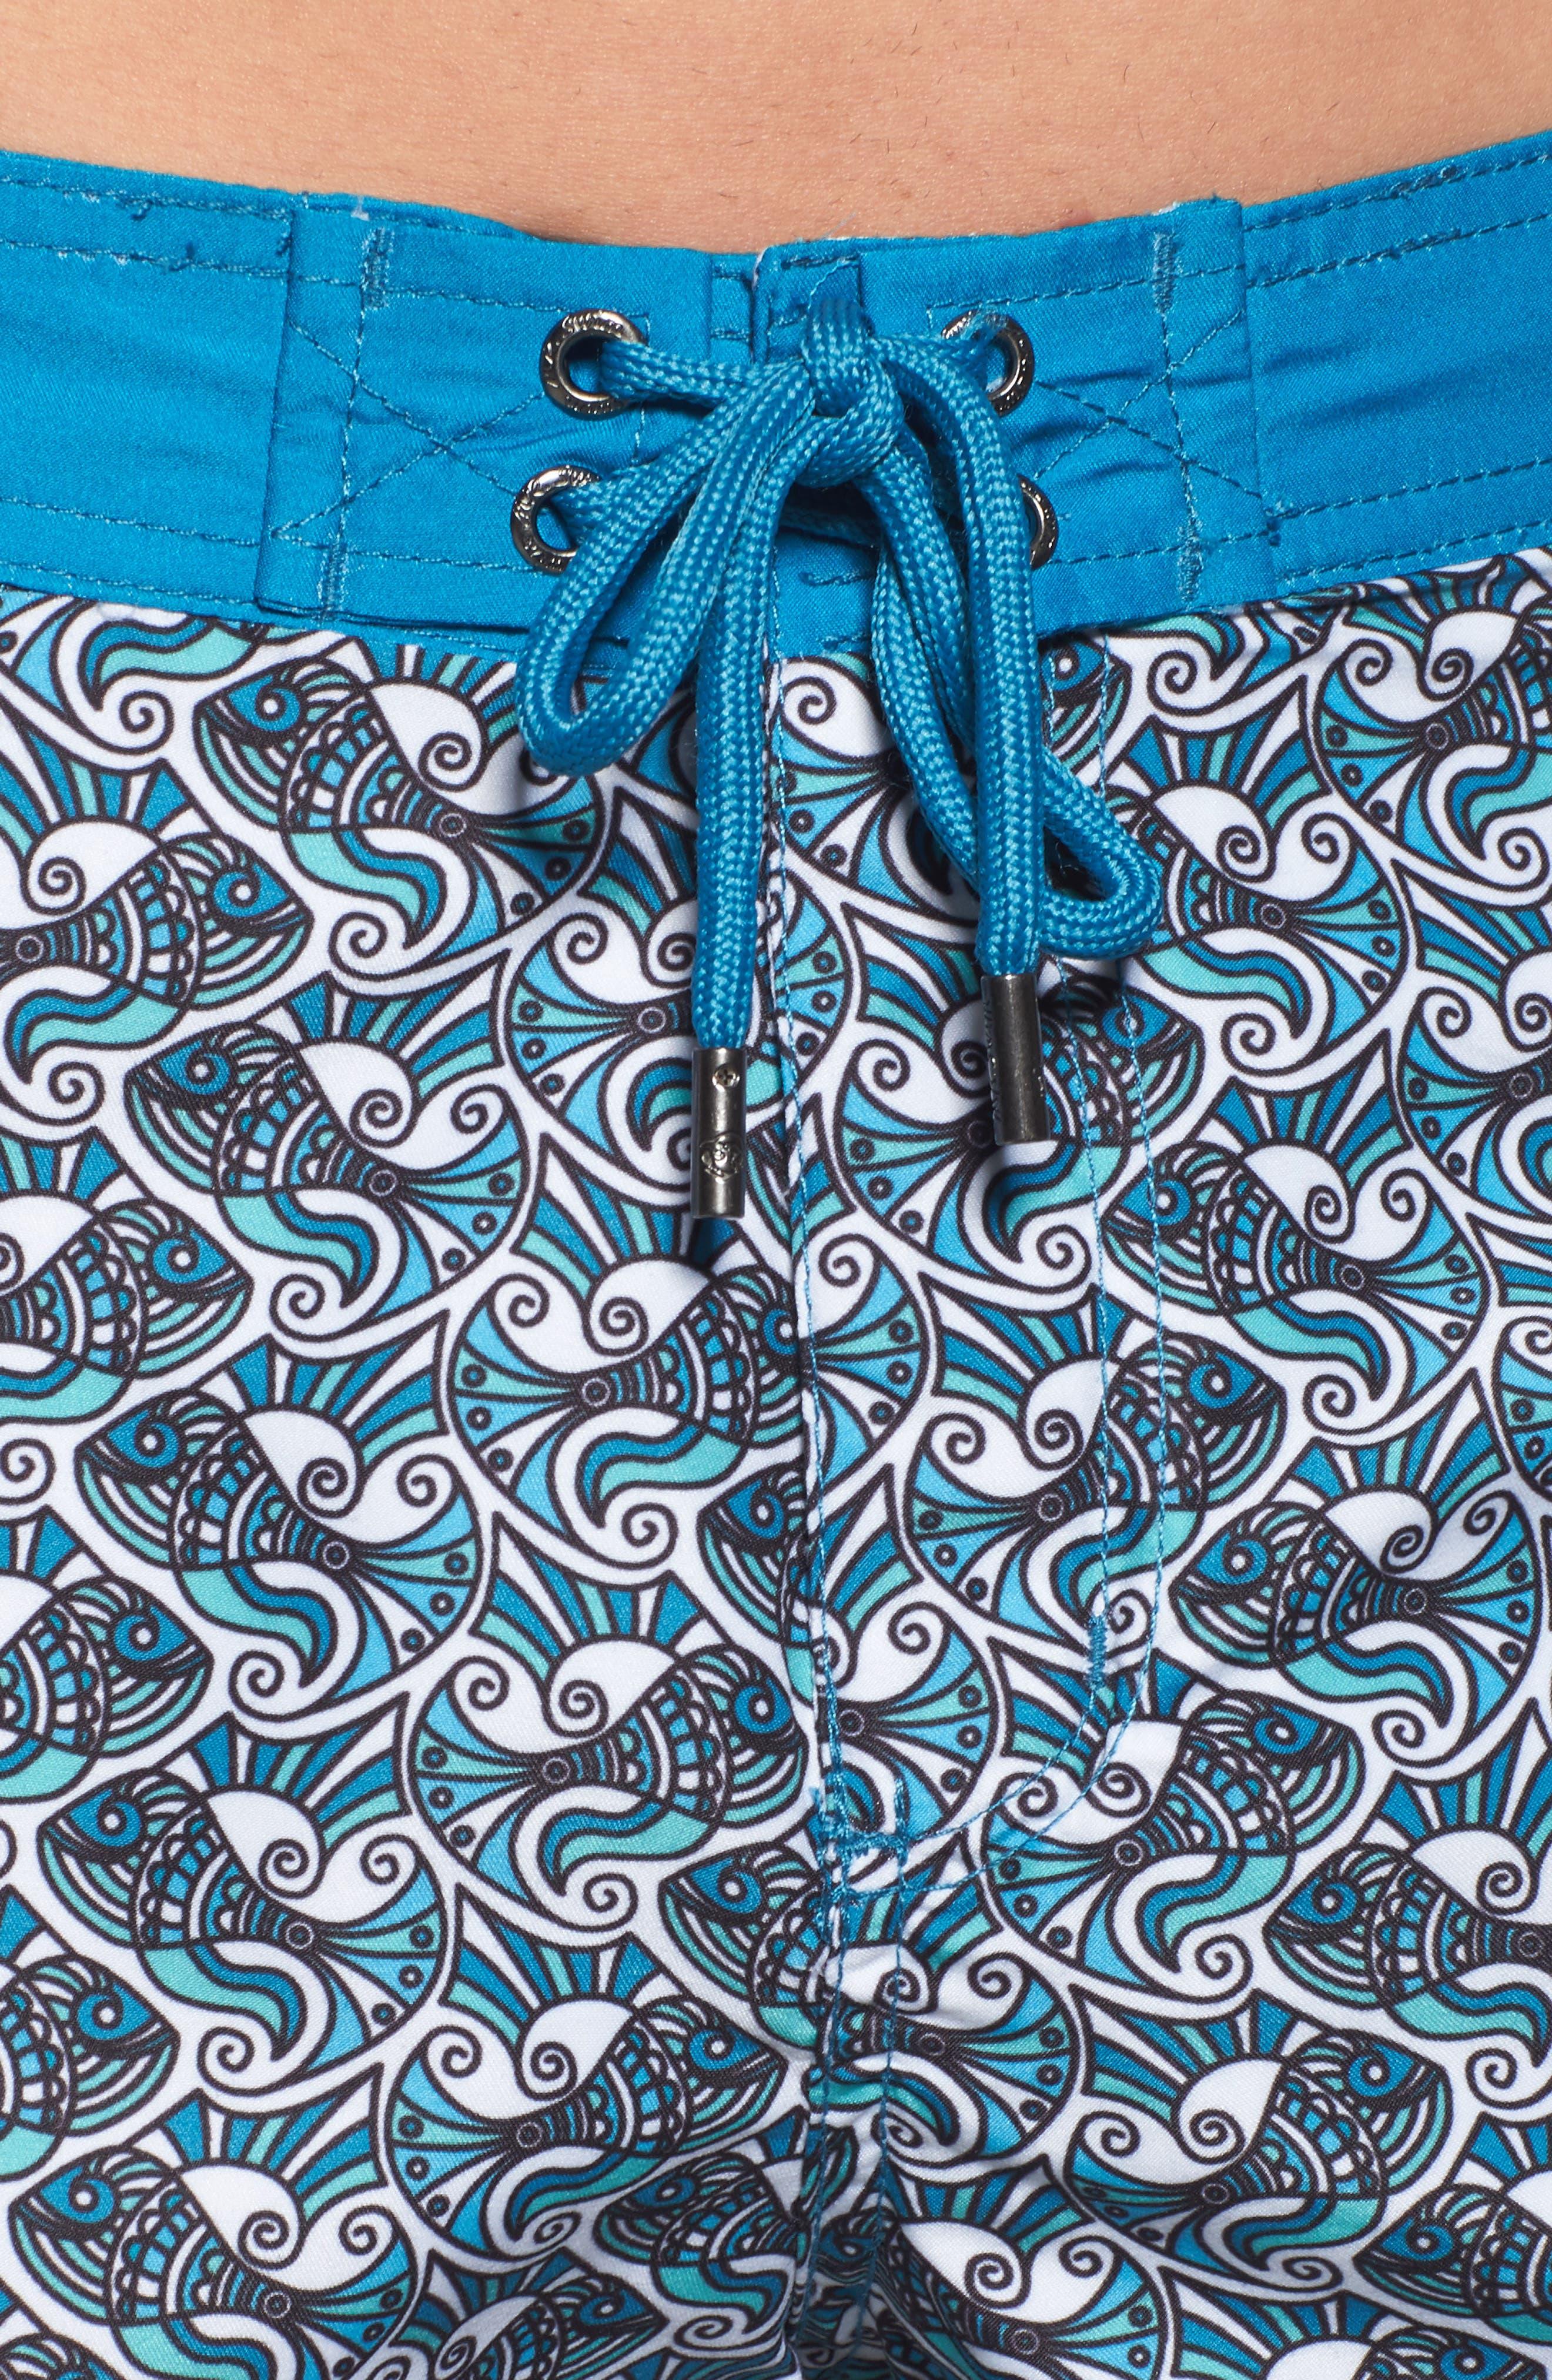 Mr. Swim Fish Swirls Print Swim Trunks,                             Alternate thumbnail 4, color,                             440